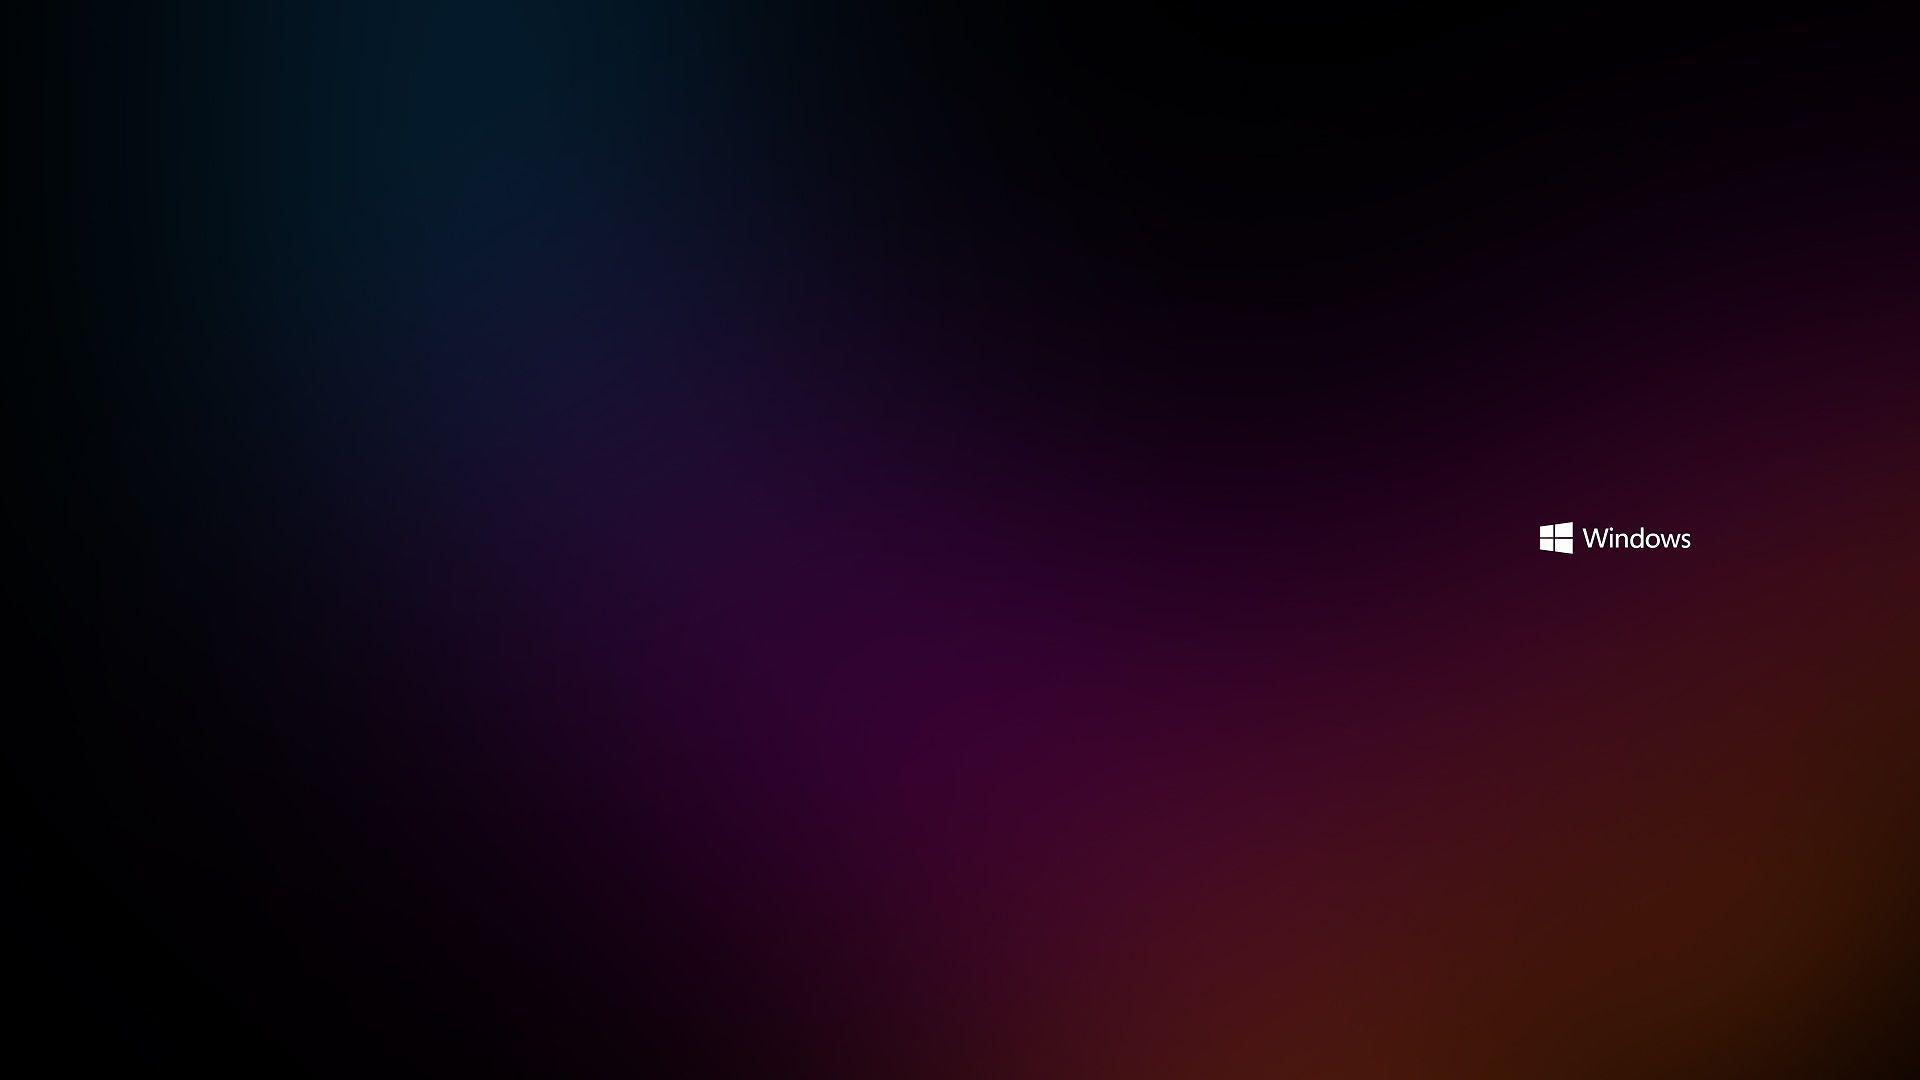 MICROSOFT BLUE RAYE Microsoft wallpaper, Windows desktop